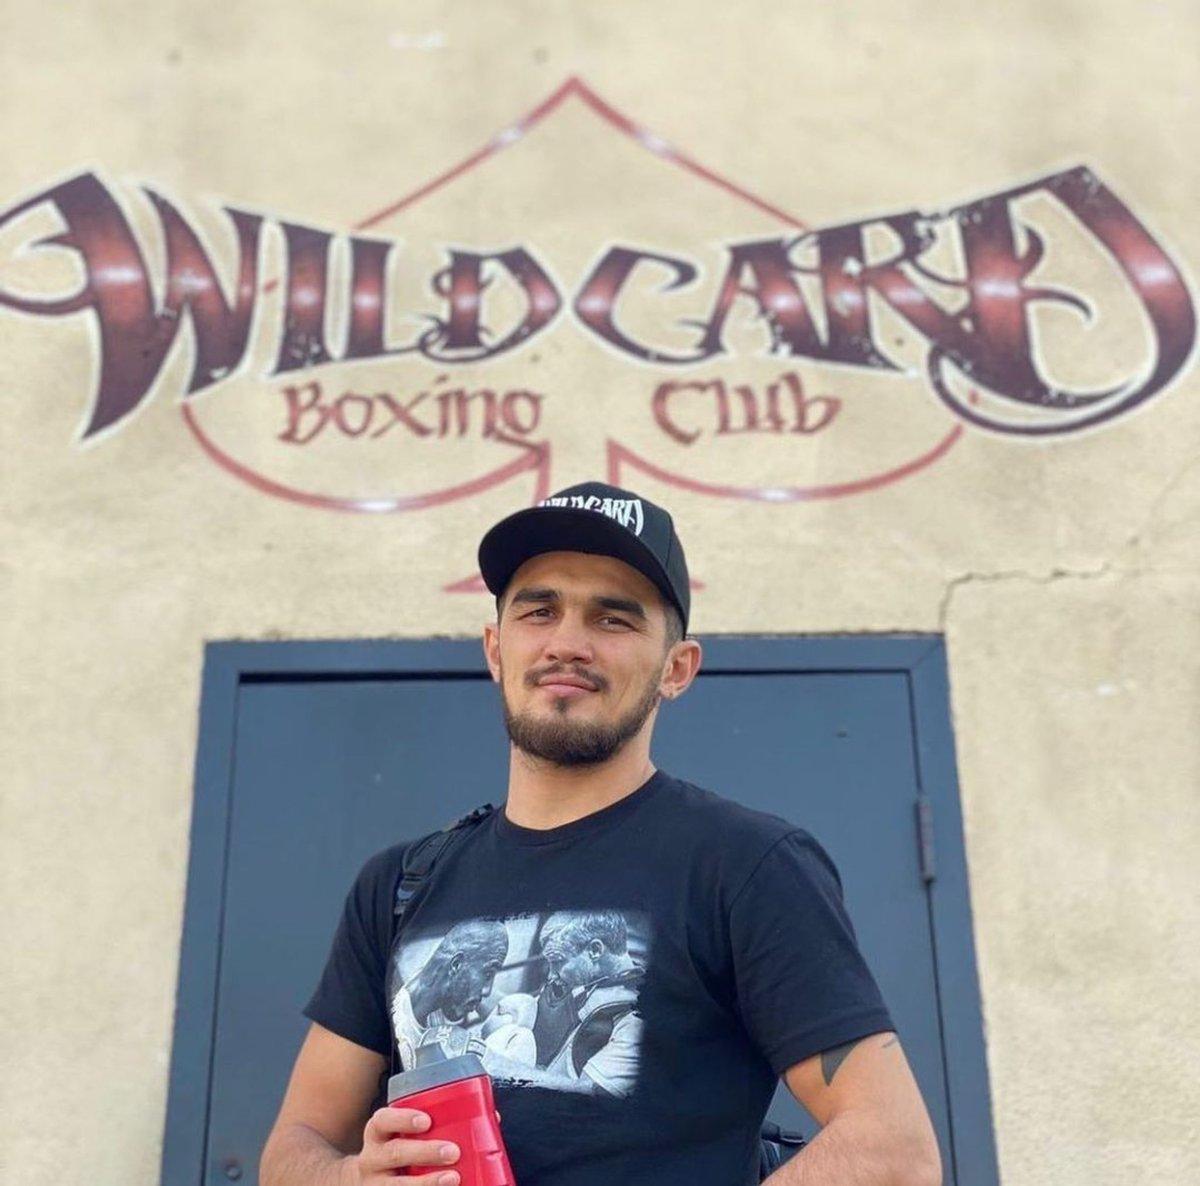 February 13th fight date for Shavkat Rakhimov who takes on current champion @JosephDiazJr for his IBF Junior Lightweight title @GoldenBoyBoxing @DAZNBoxing @FantasySprings #TeamRakhimov @FreddieRoach @KlimasBoxing @WCBstore #wildcardboxing #boxing #boxer #fighter 📸 Zhanna Popova